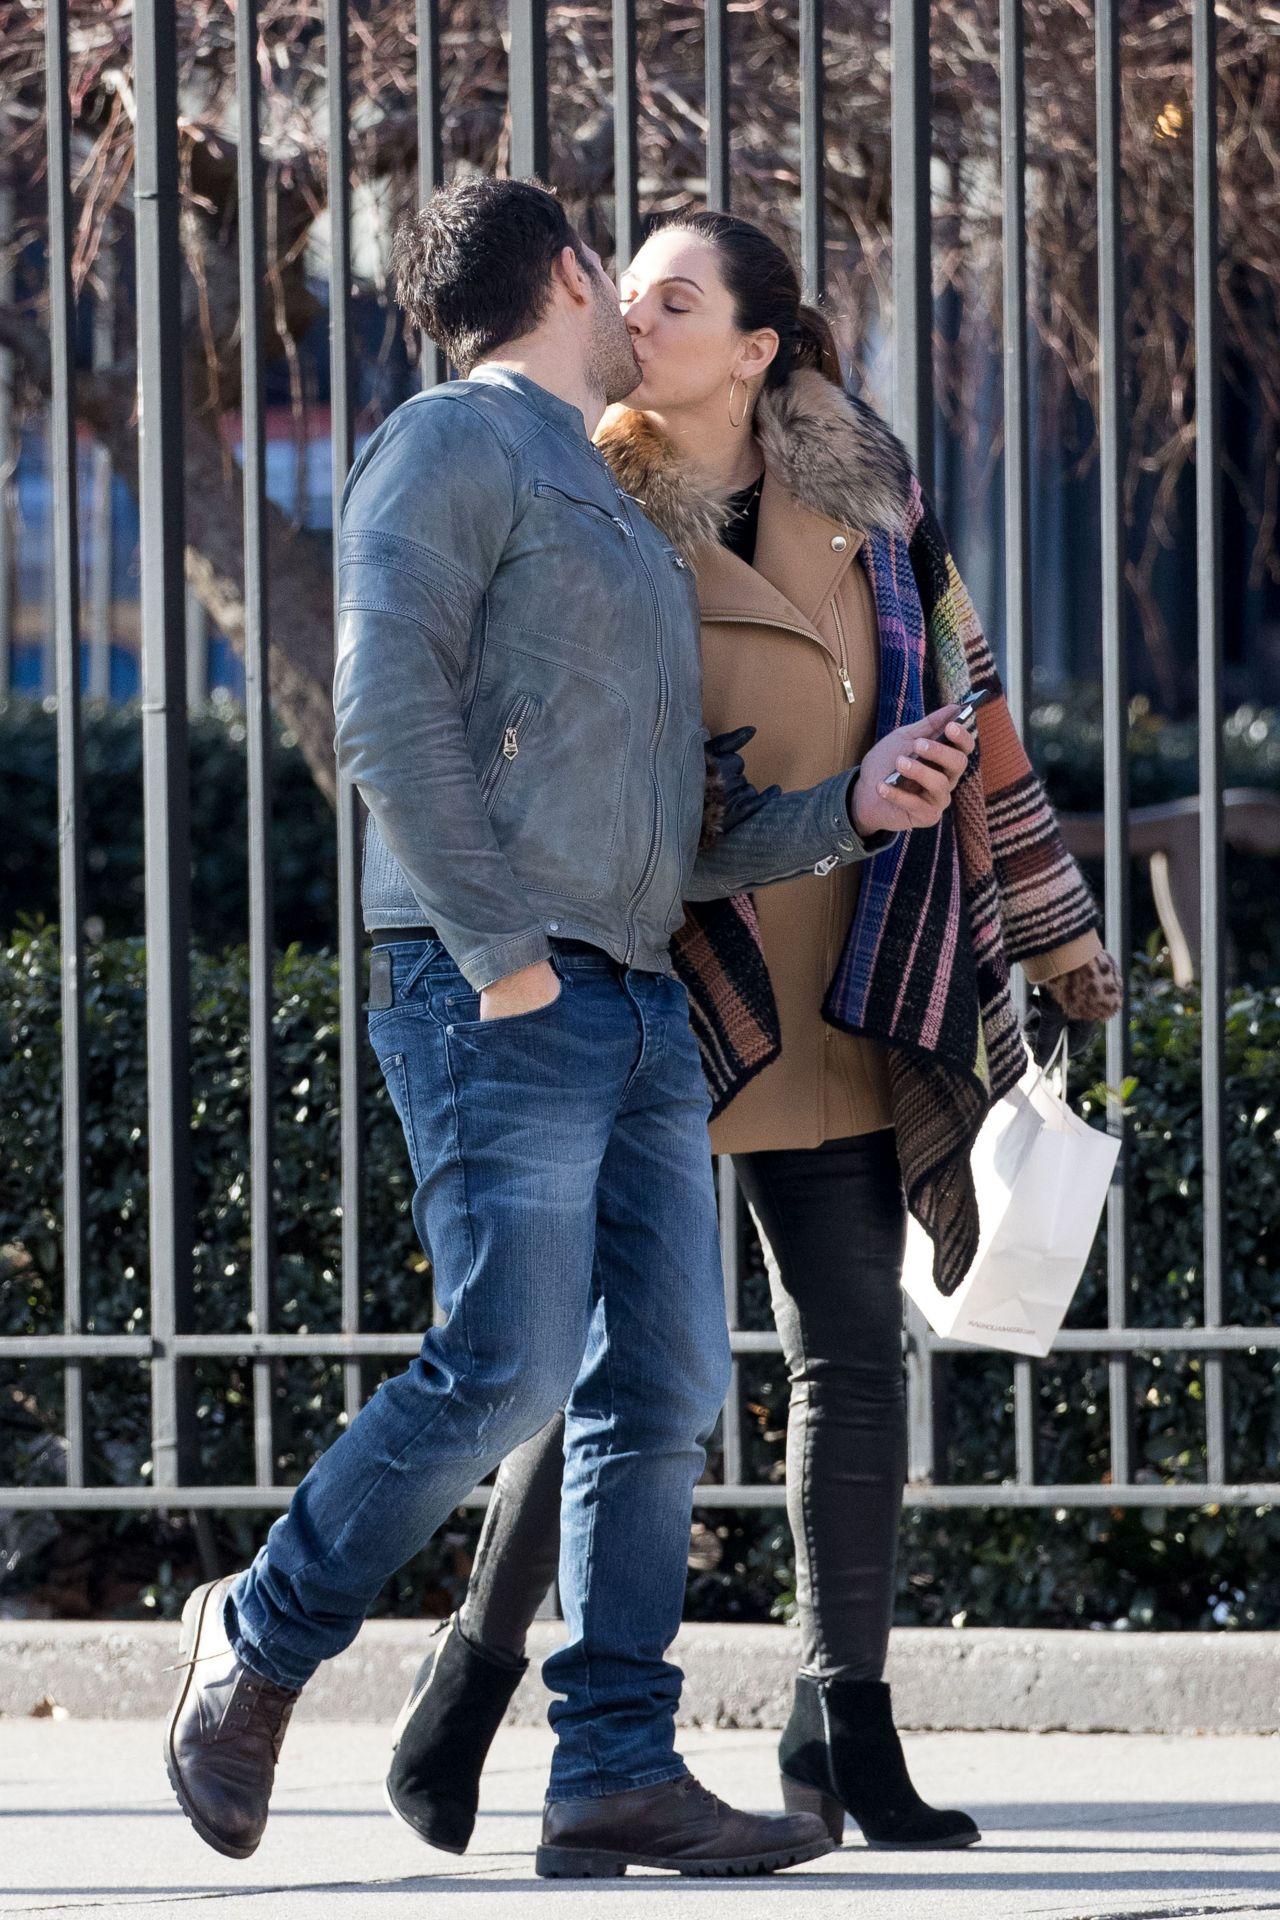 photo Kelly brook kisses boyfriend jeremy parisi nyc